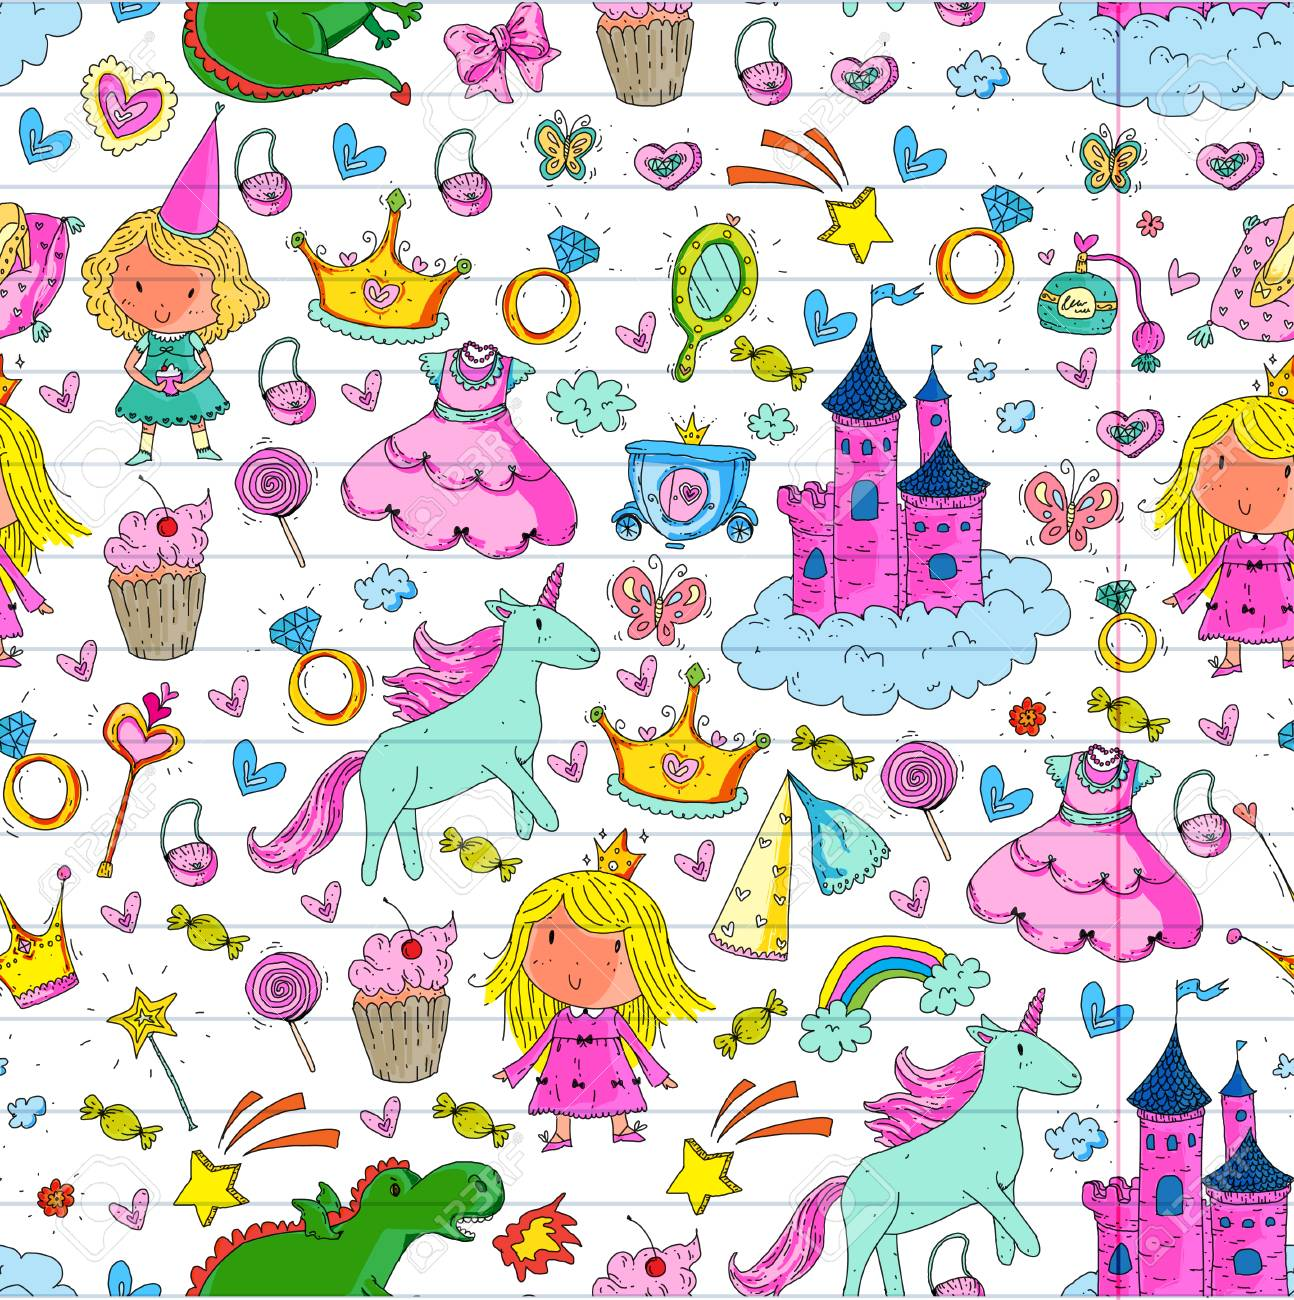 Cute Princess Icons Set With Unicorn Dragon Girl Wallpaper Baby 1294x1300